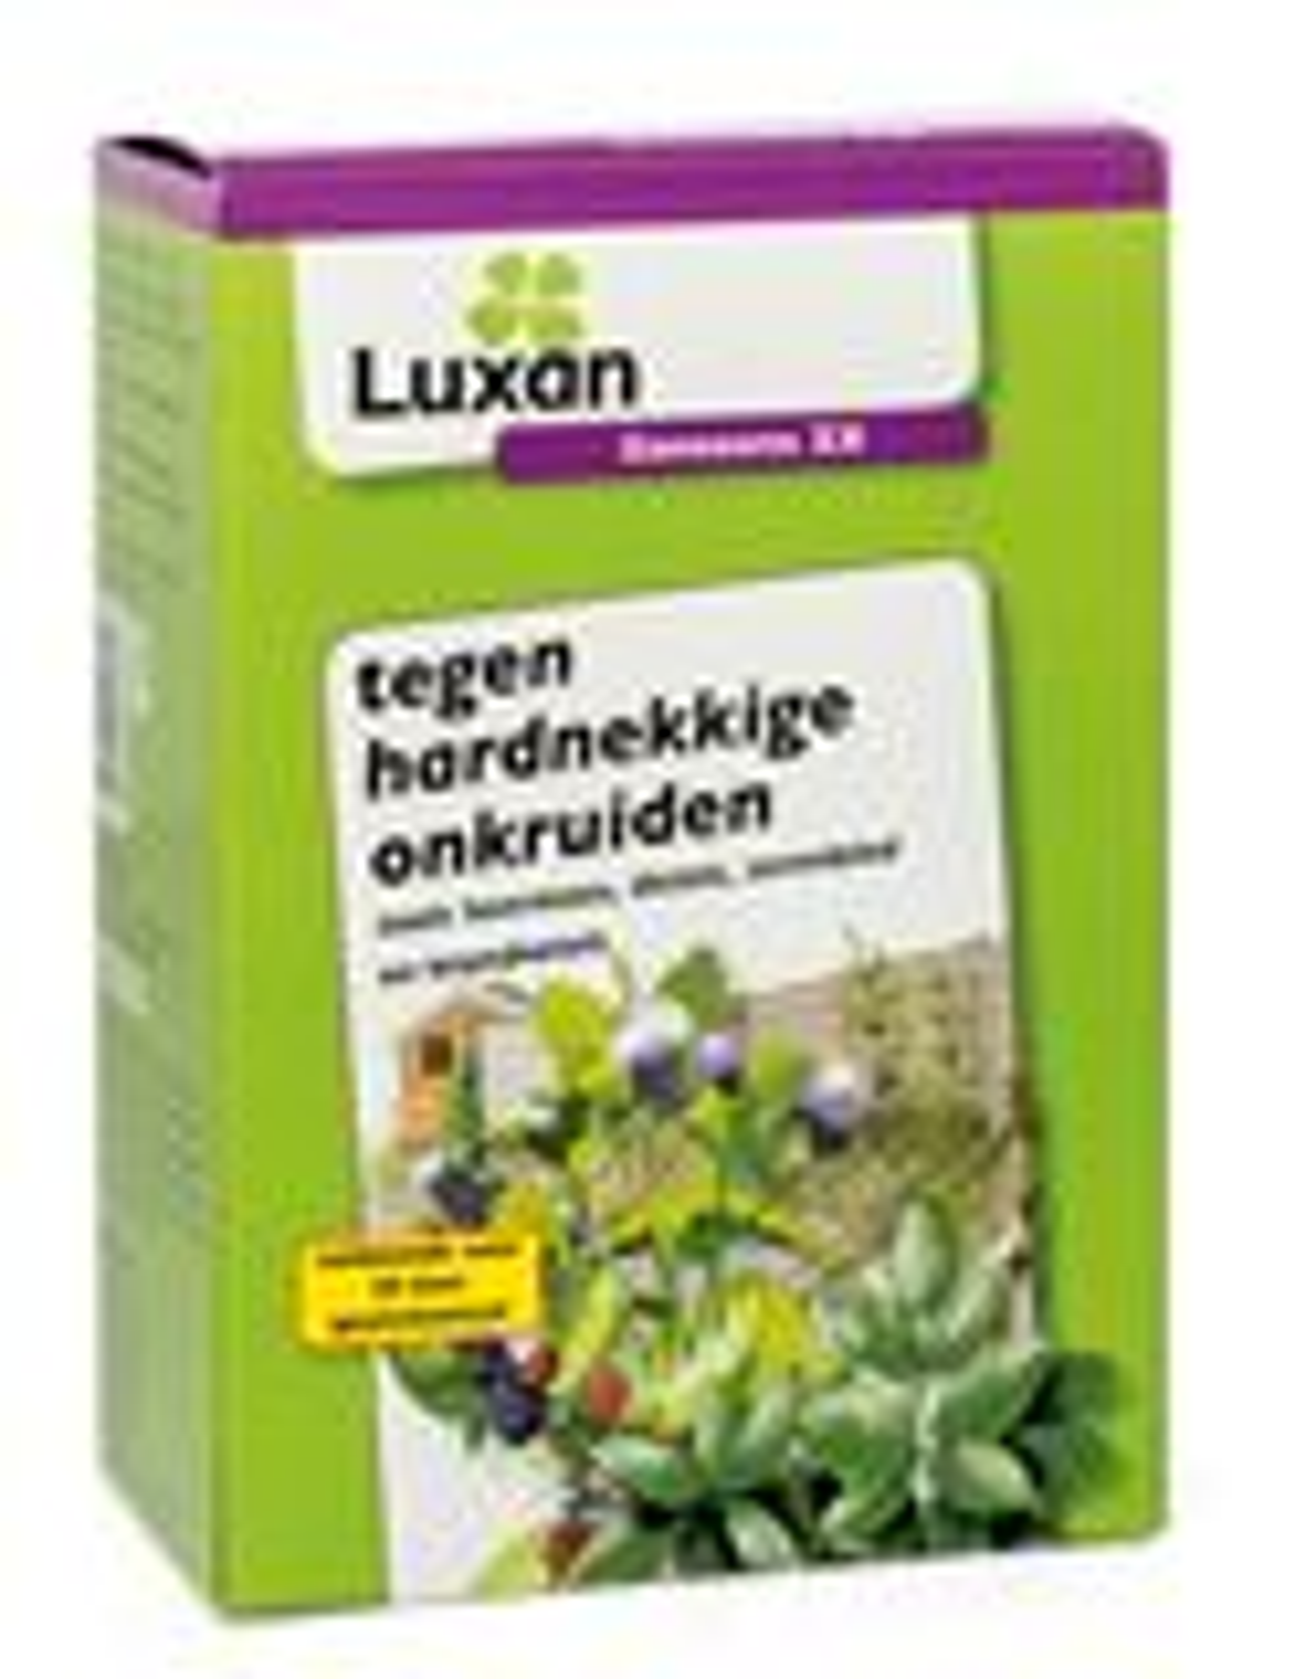 Luxan genoxone zx - 250 ml - tegen onkruiden (spaart grassen)